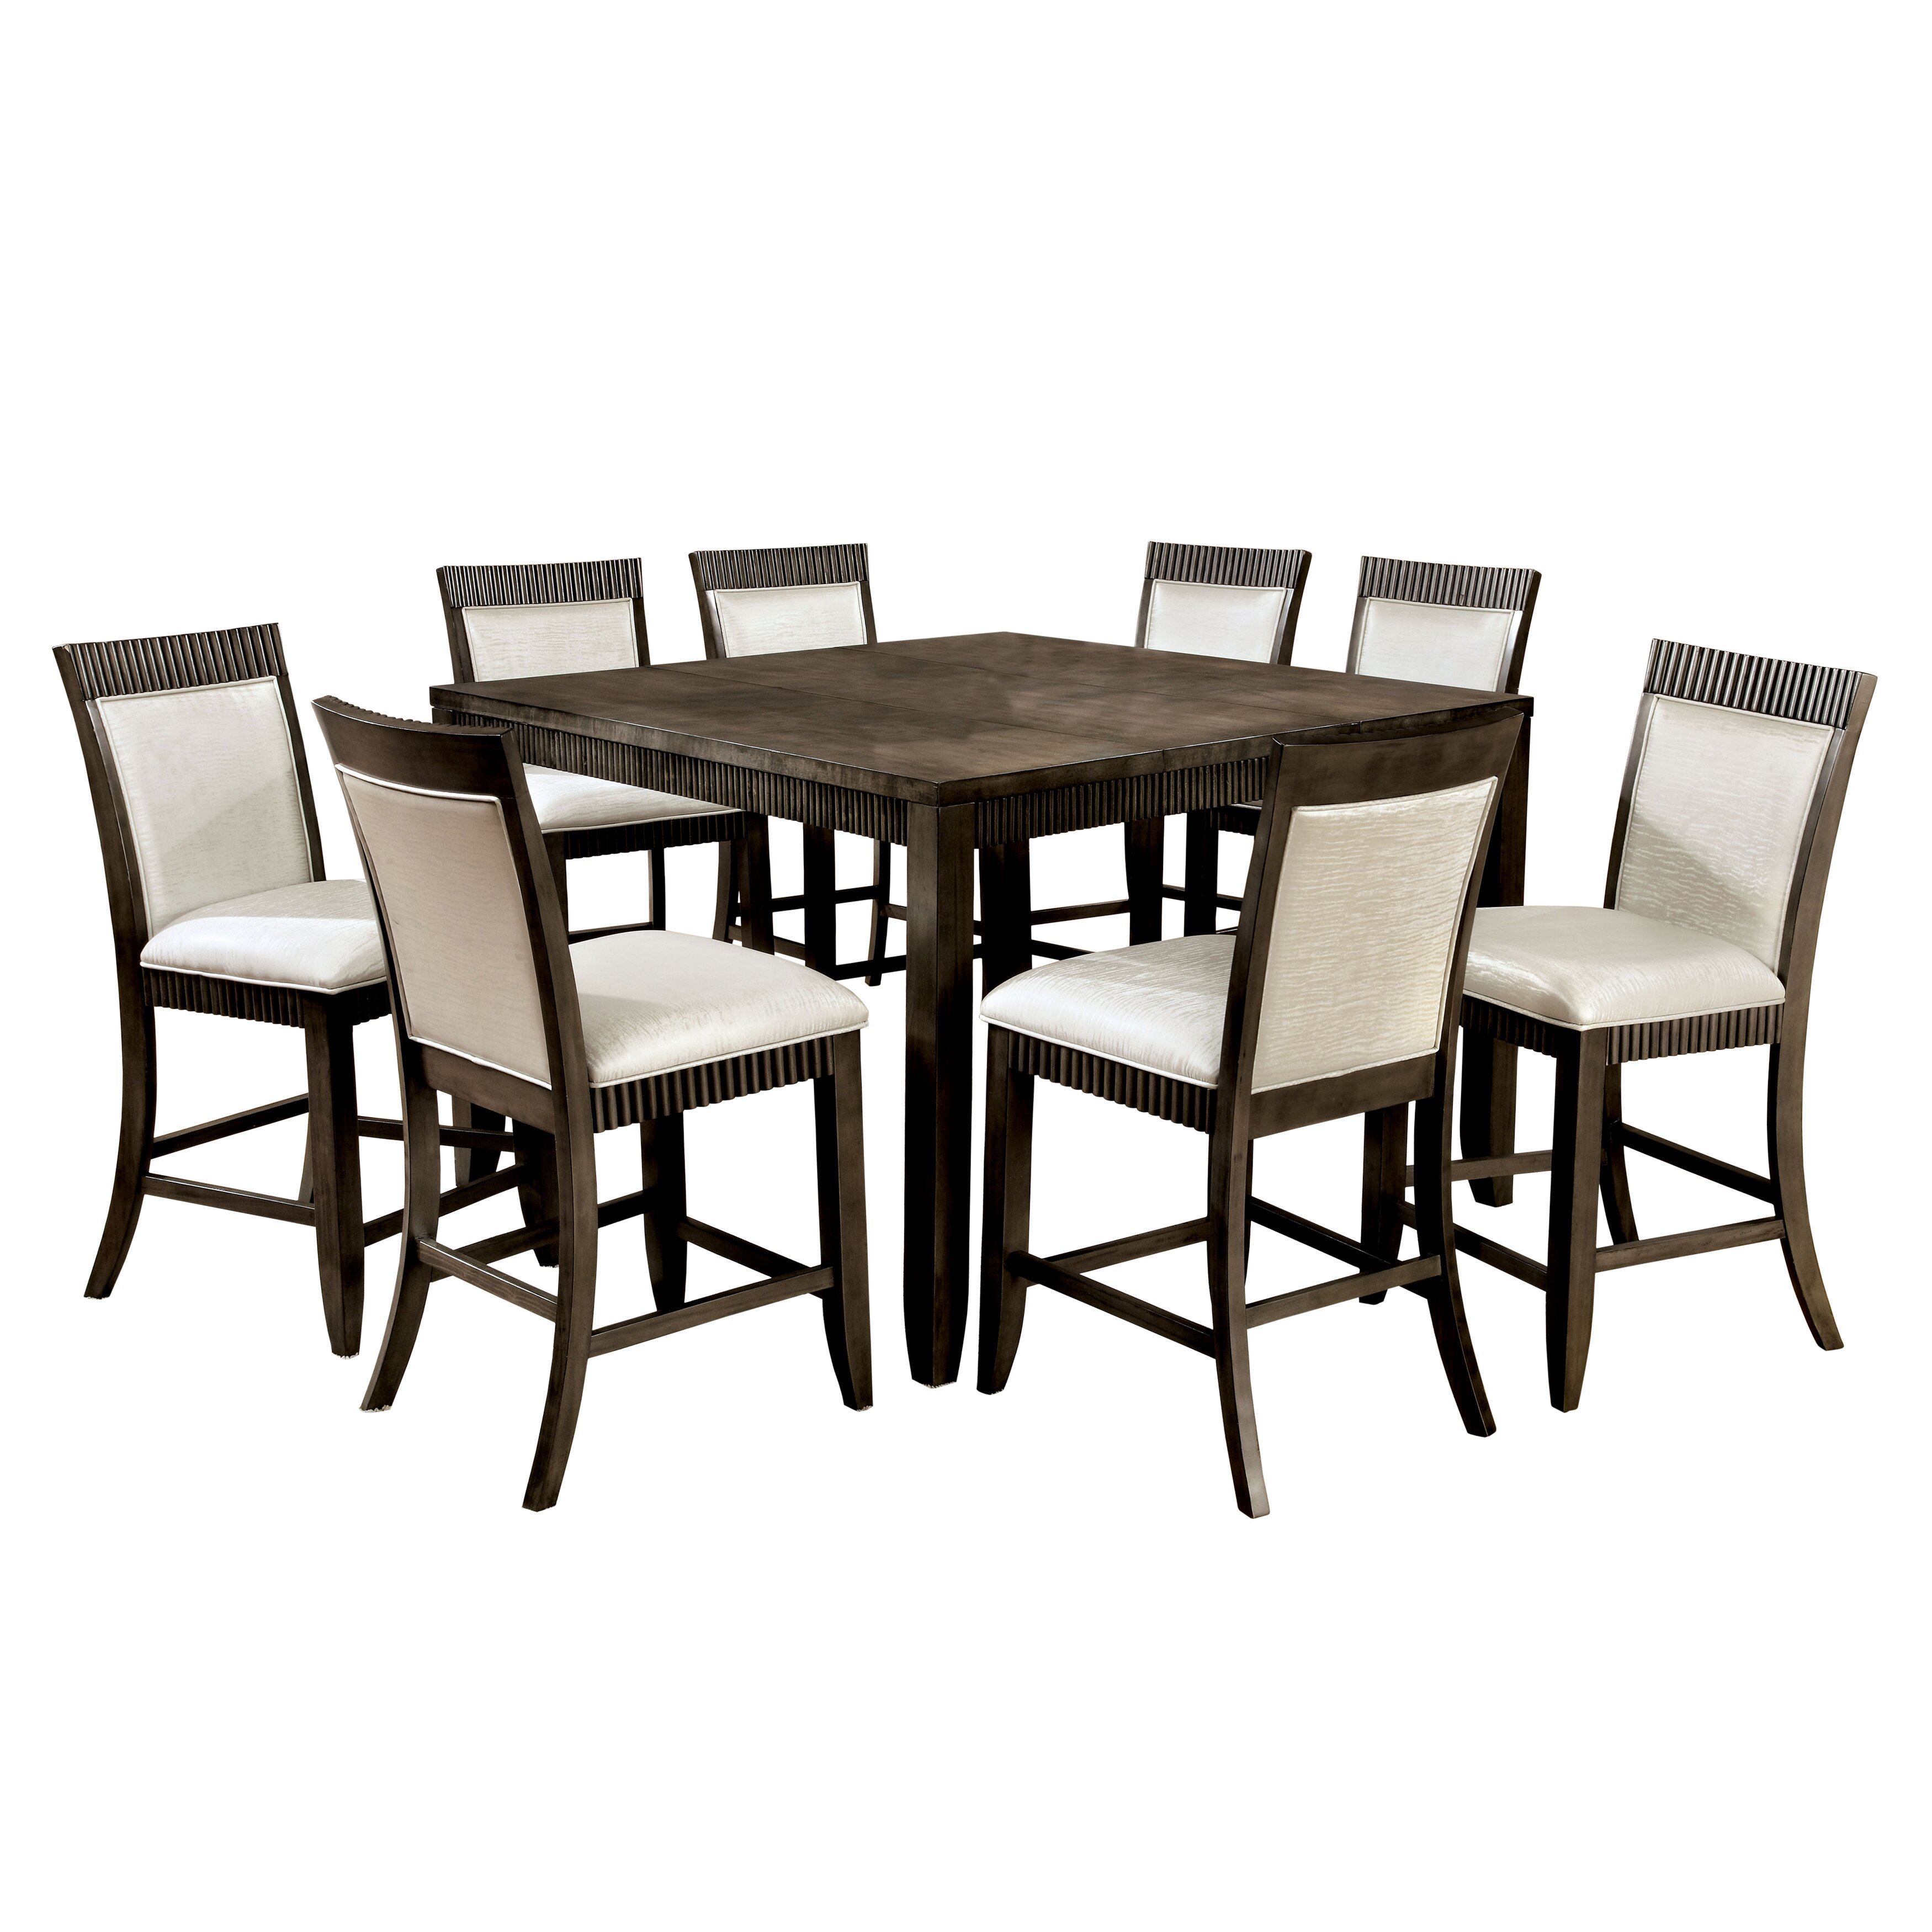 Hokku designs gayet 9 piece dining set reviews wayfair for Hokku designs dining room furniture